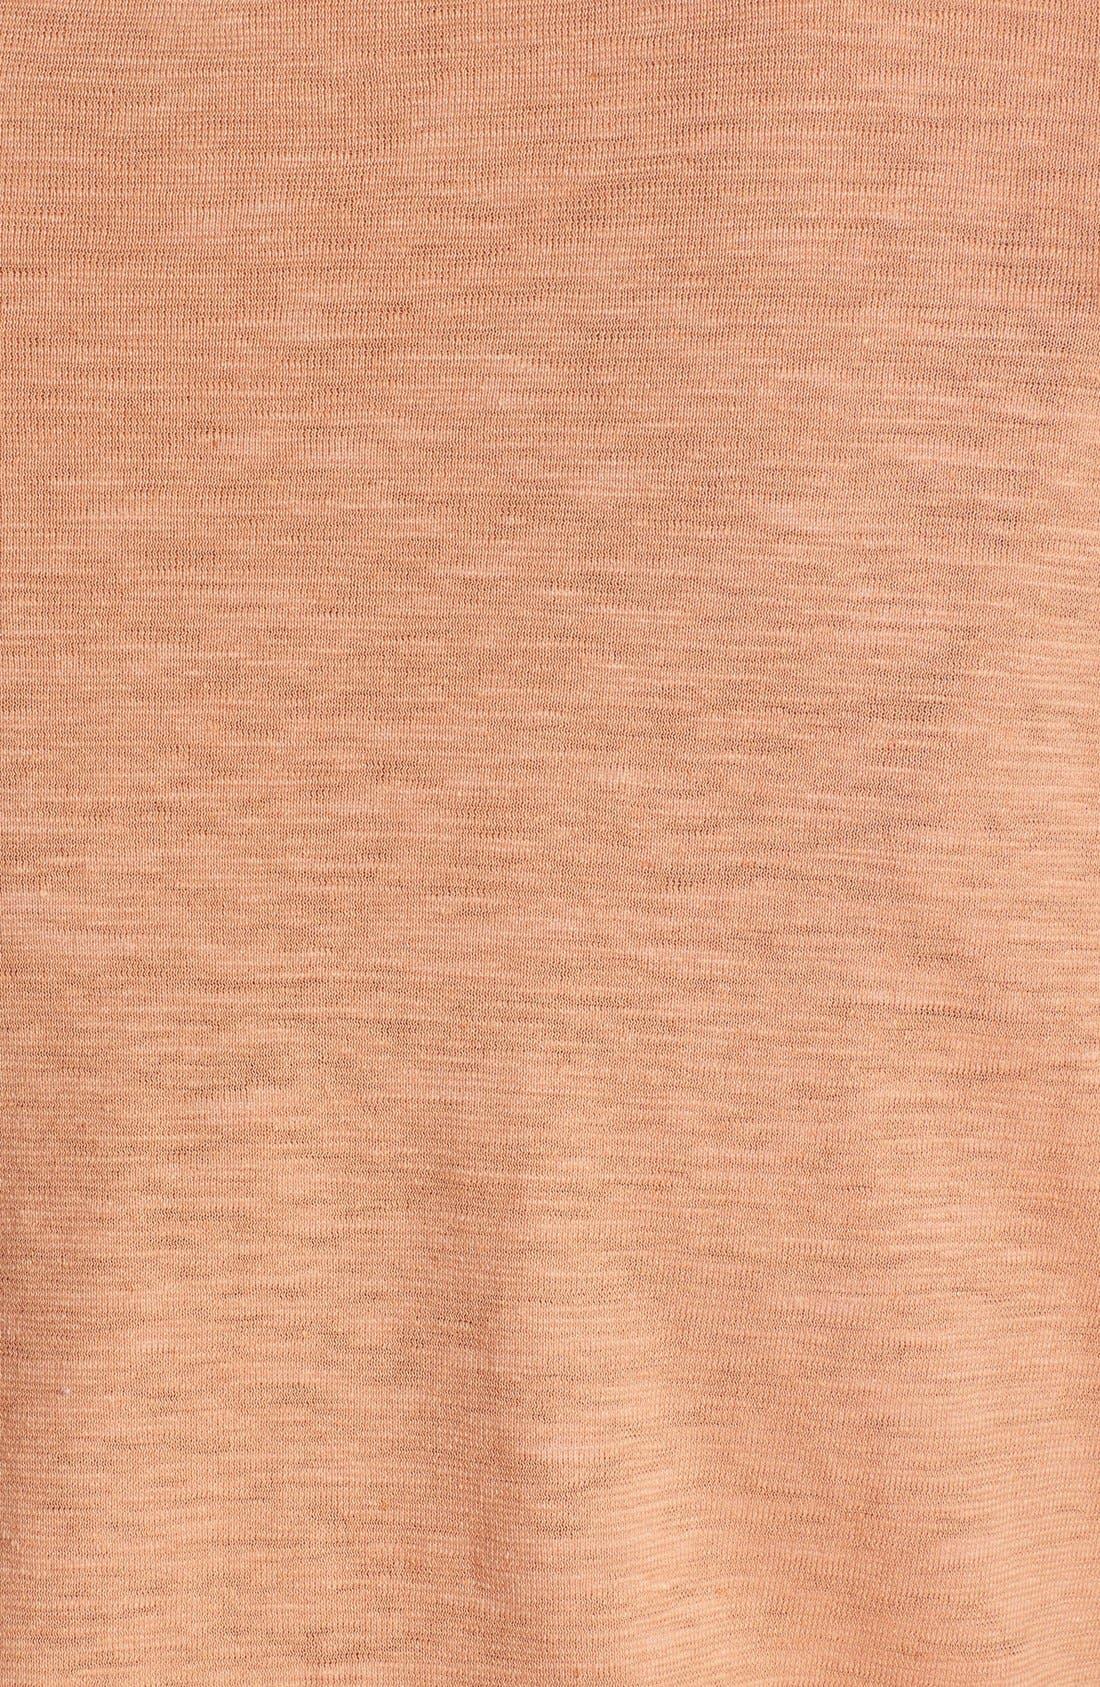 Alternate Image 3  - Eileen Fisher Hemp & Organic Cotton Scoop Neck Top